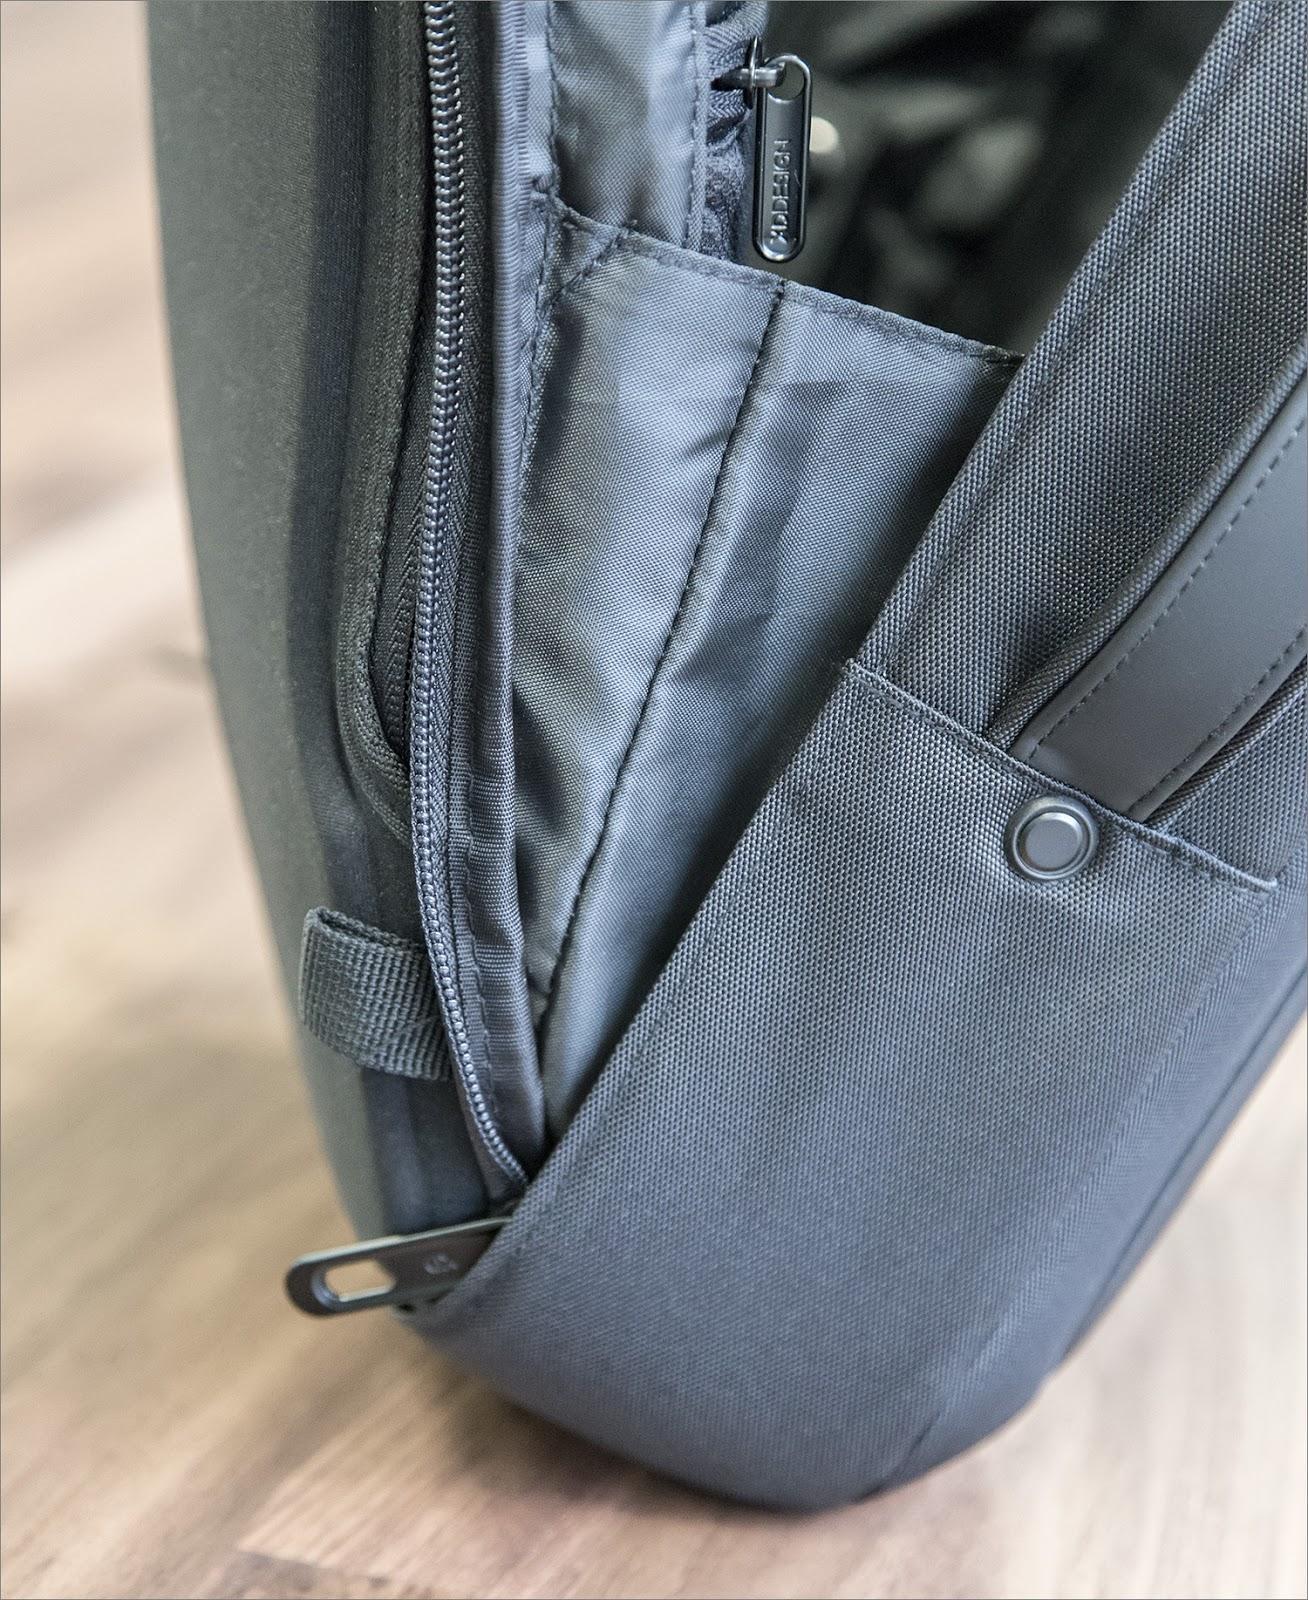 Обзор рюкзака XD Bobby Bizz [ Читать в инкогнито-вкладке ] - 19